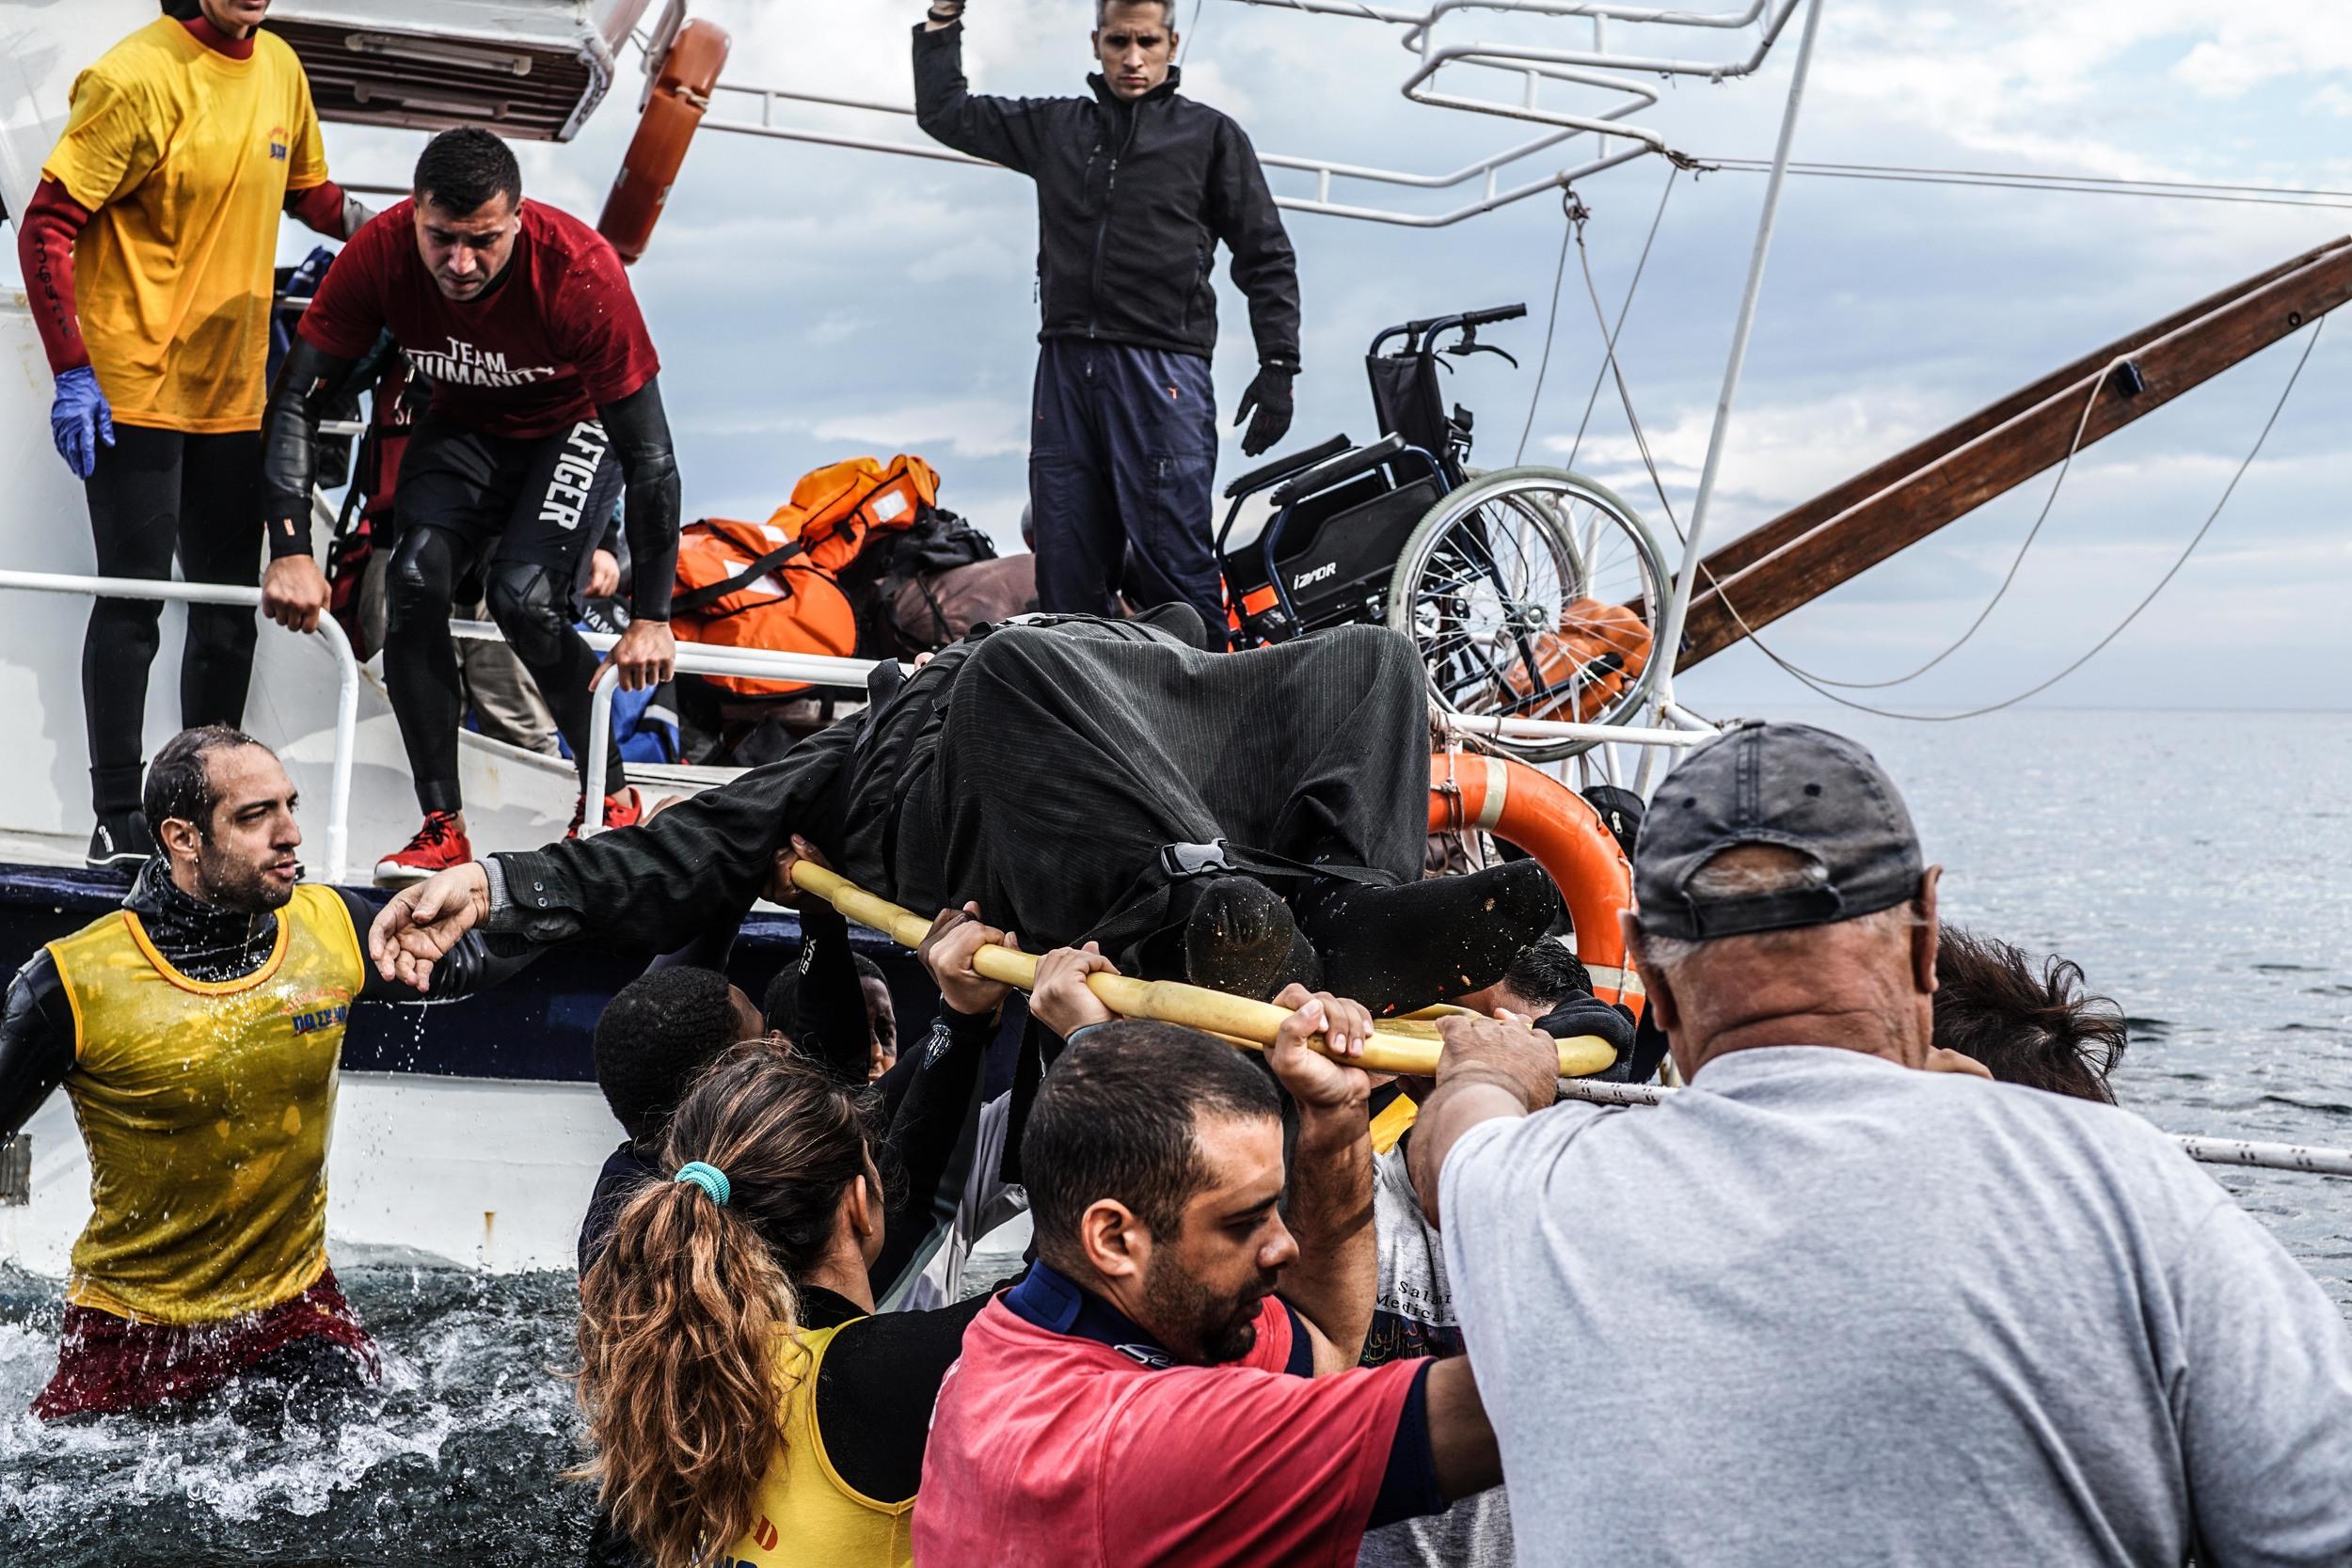 Syrian Refugee Crisis Lesbos Greece November 2015 15.jpg